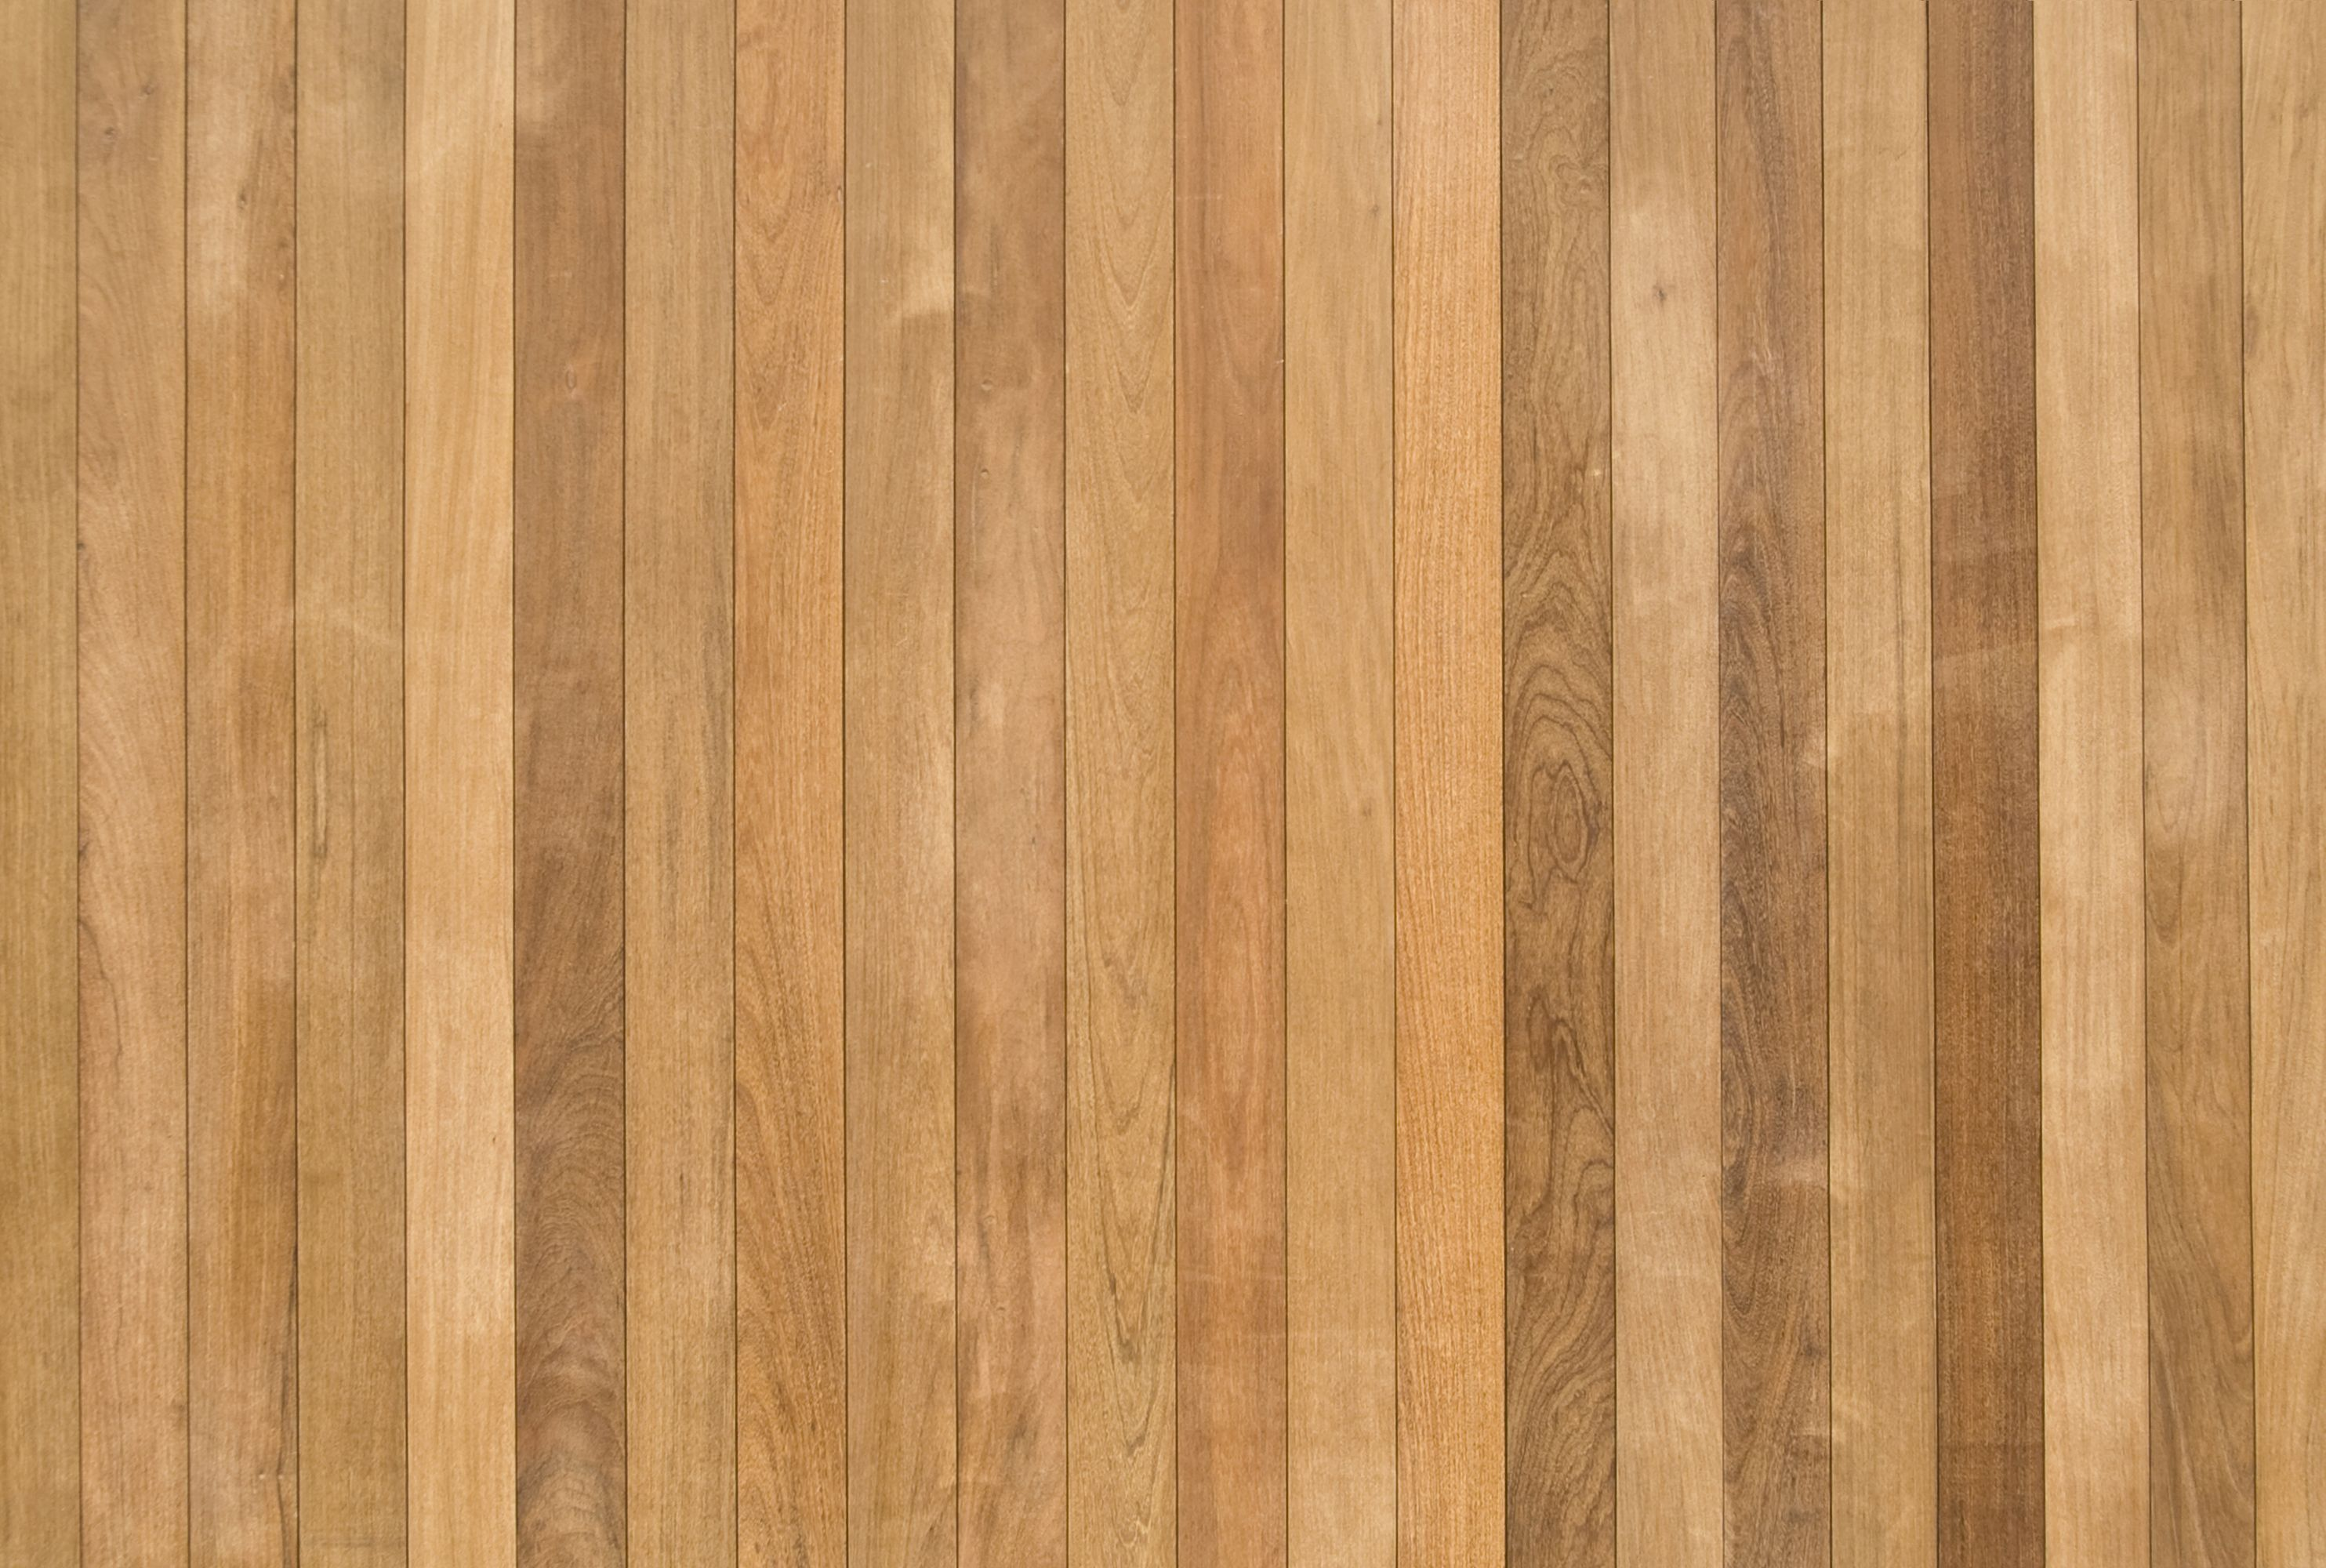 Oak Wood Planks ~ Exquisite oak wood planks minecraft wiki